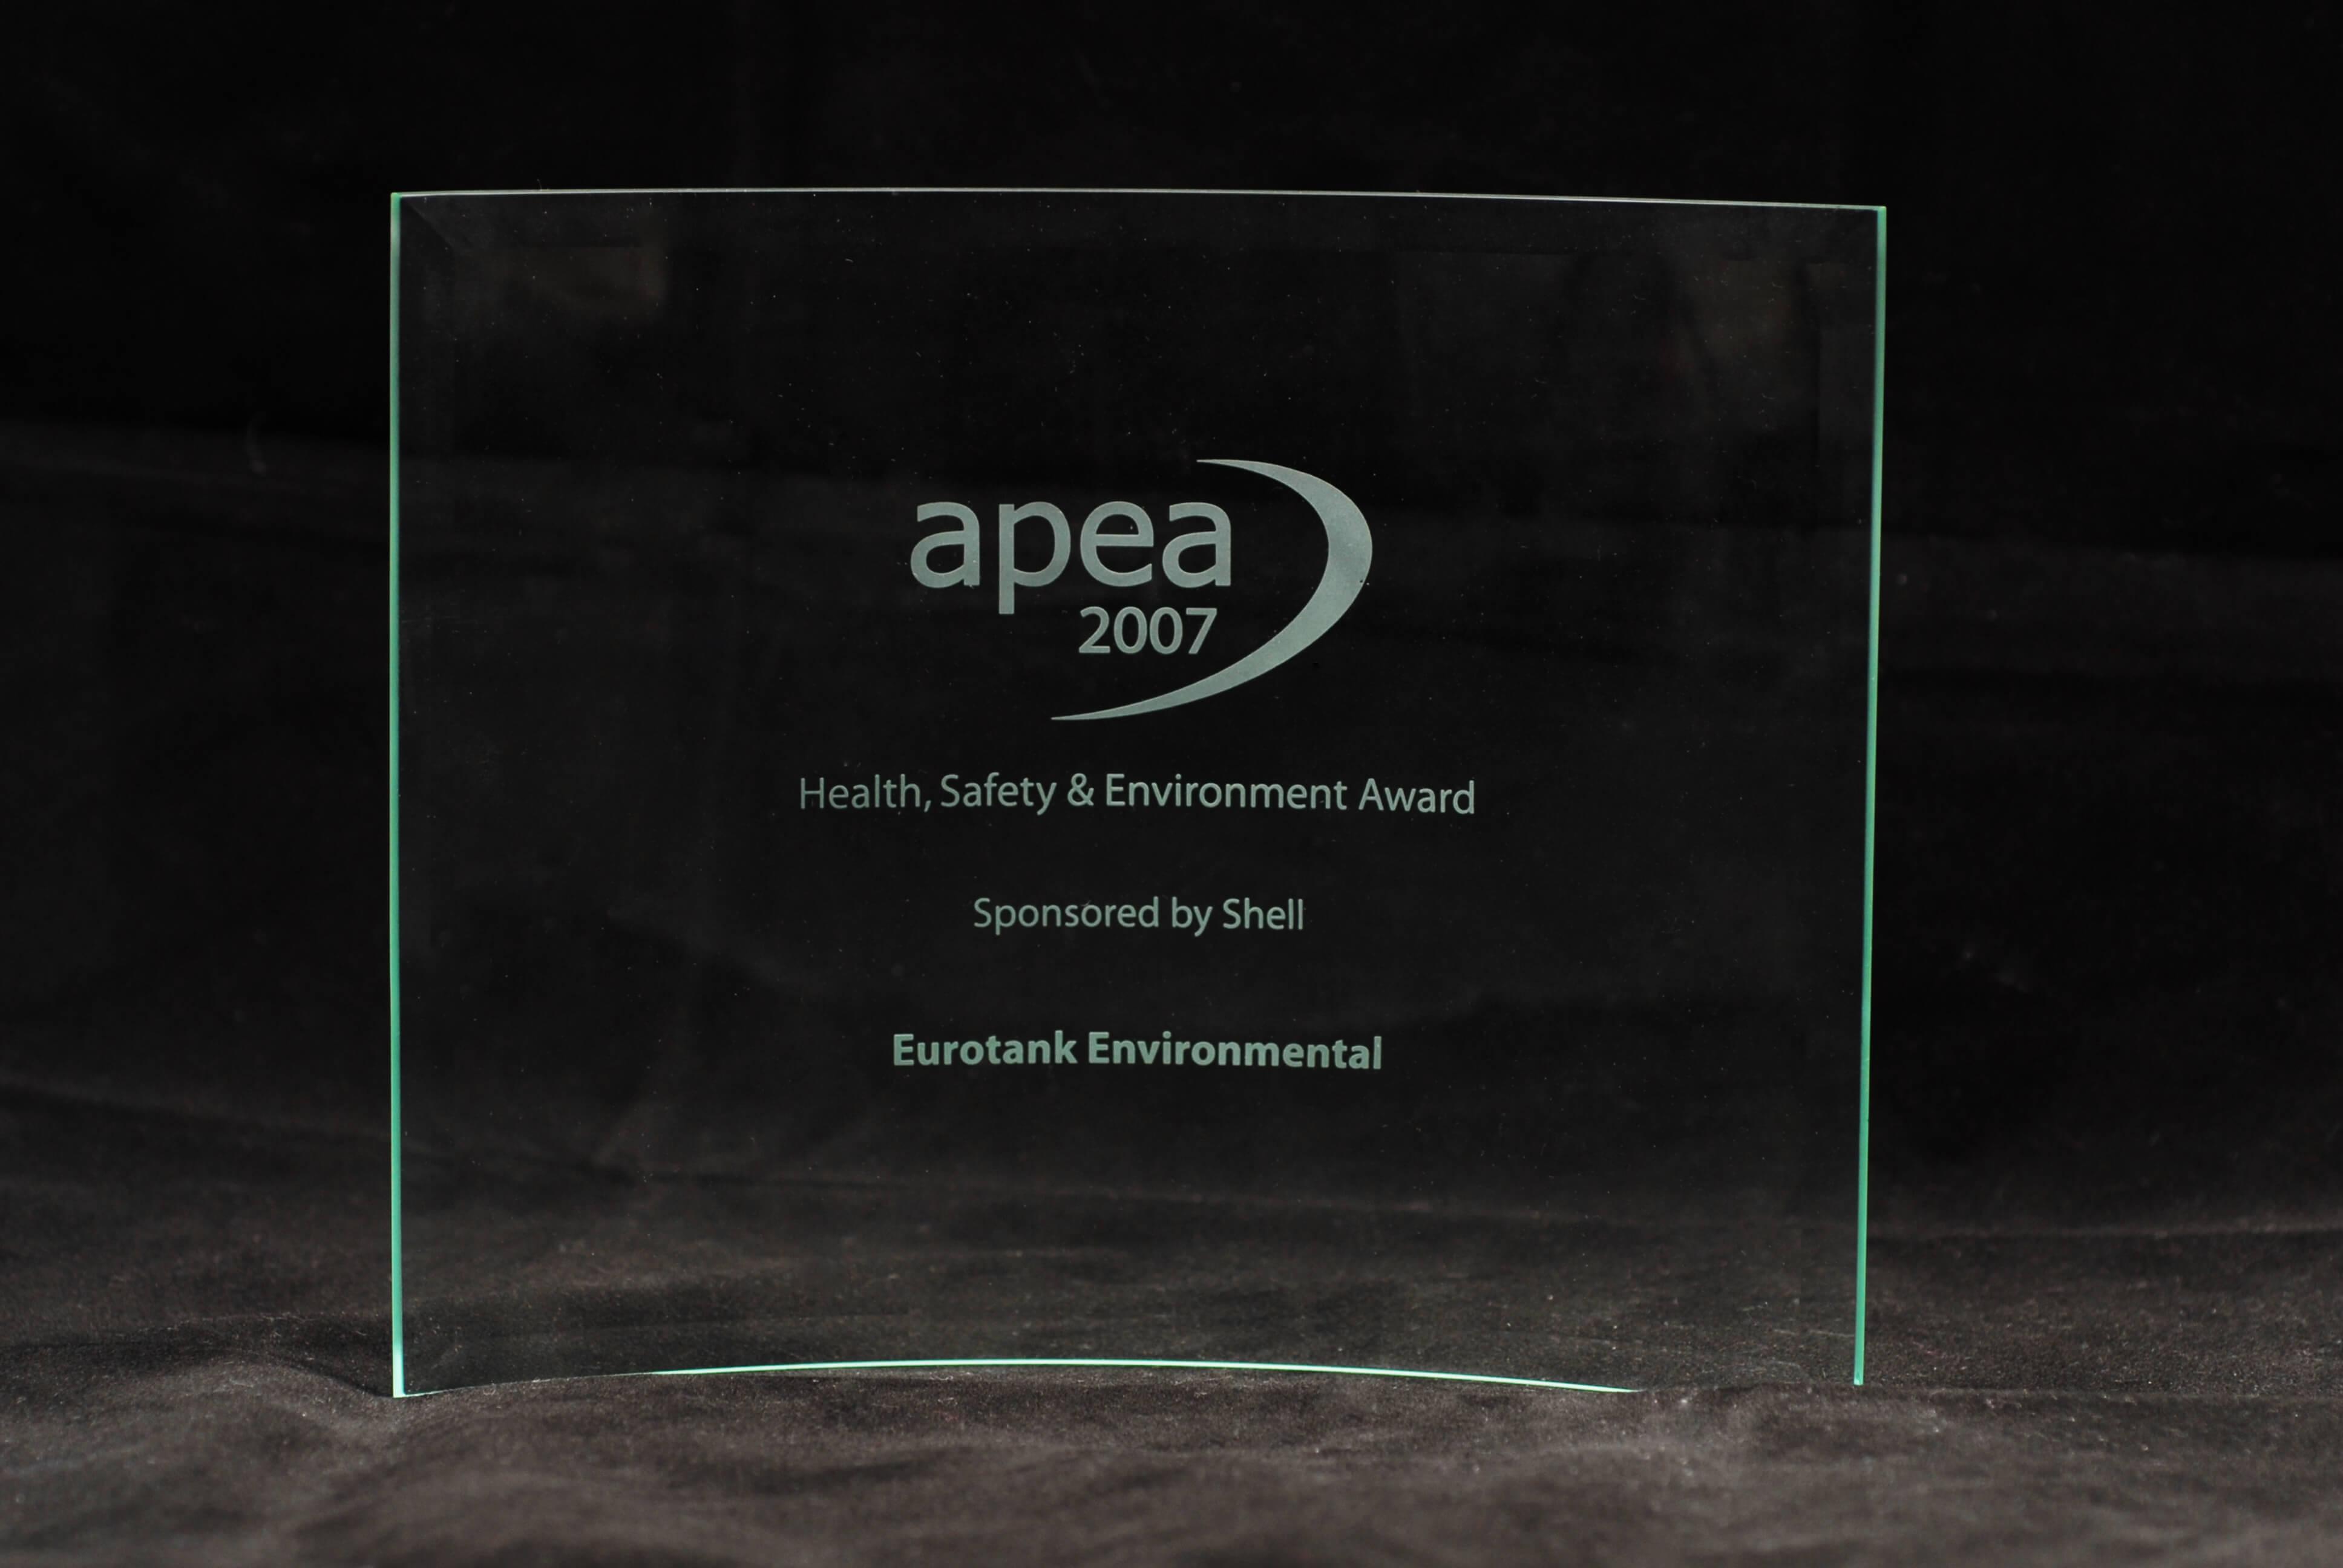 APEA Health & Safety Award